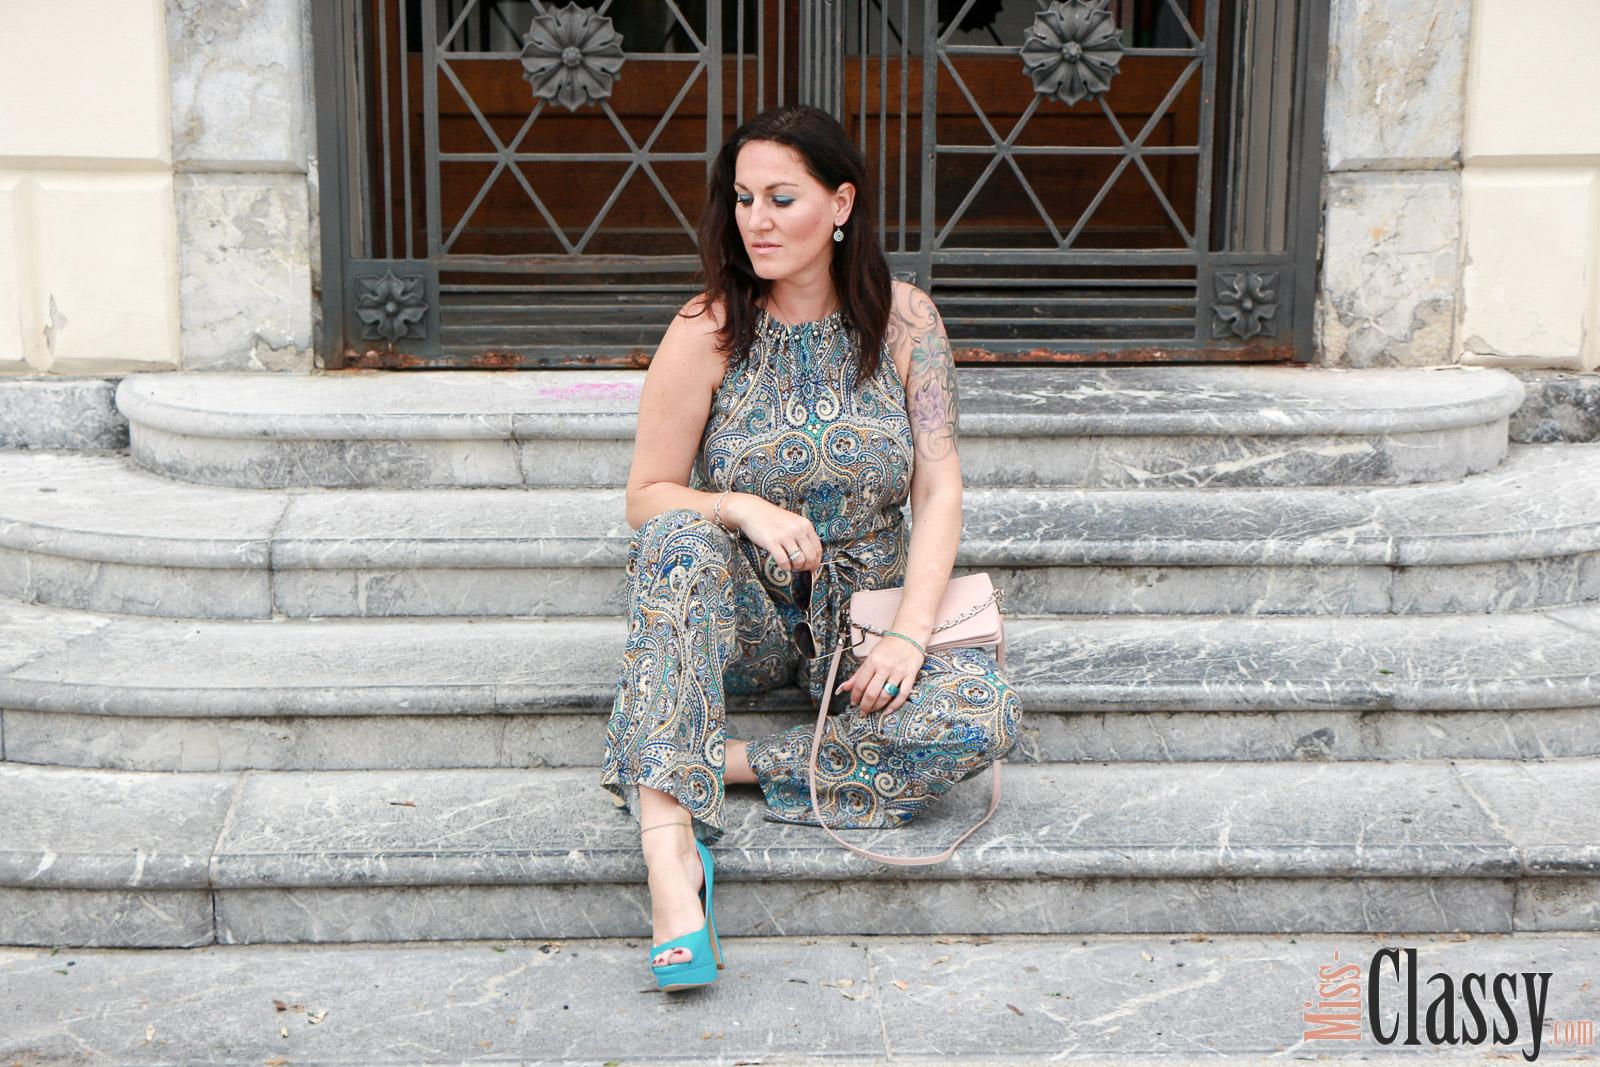 OUTFIT Jumpsuit mit Muster und türkisen High Heels, Miss Classy, miss-classy.com, Fashionblog, Fashionblogger, Fashionblog Graz, Lifestyle Blog Graz, Lifestyleblog, Graz, Steiermark, Österreich, classy, beclassy, classy Fashion, Outfit, Style, Fashion, Mode, OOTD, Lippenstift MAC, MAC Cosmetics, High Heels, Pilotenbrille, Sonnenbrille, rosa Clutch, Jumpsuit von Orsay, Orsay